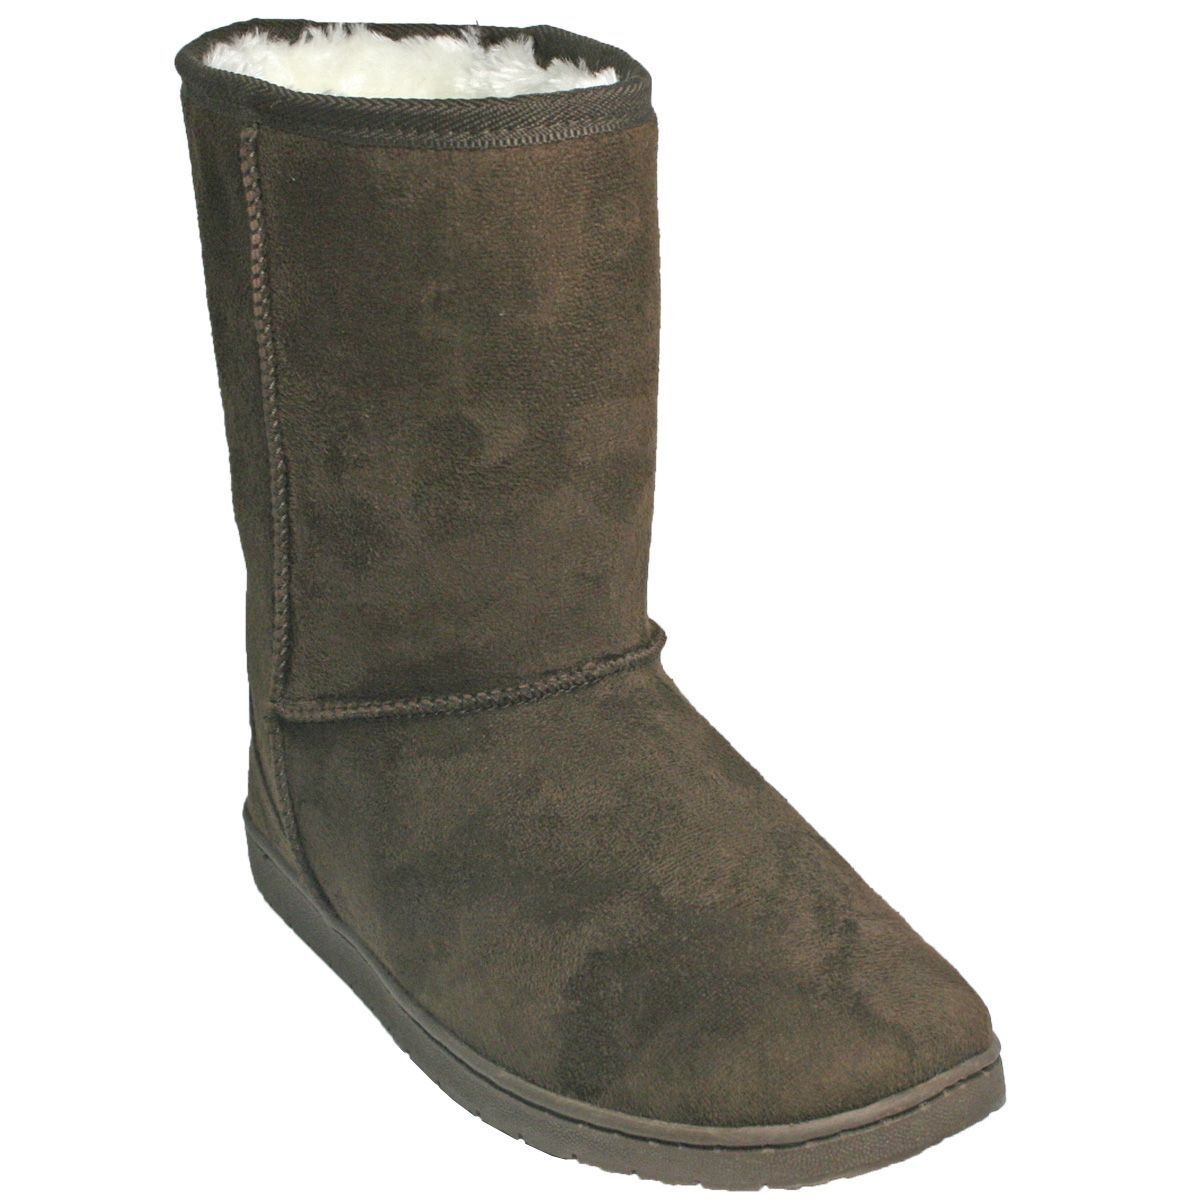 Women's DAWGS 9  Microfiber Boots Choolate Size 6  NC62E-M14